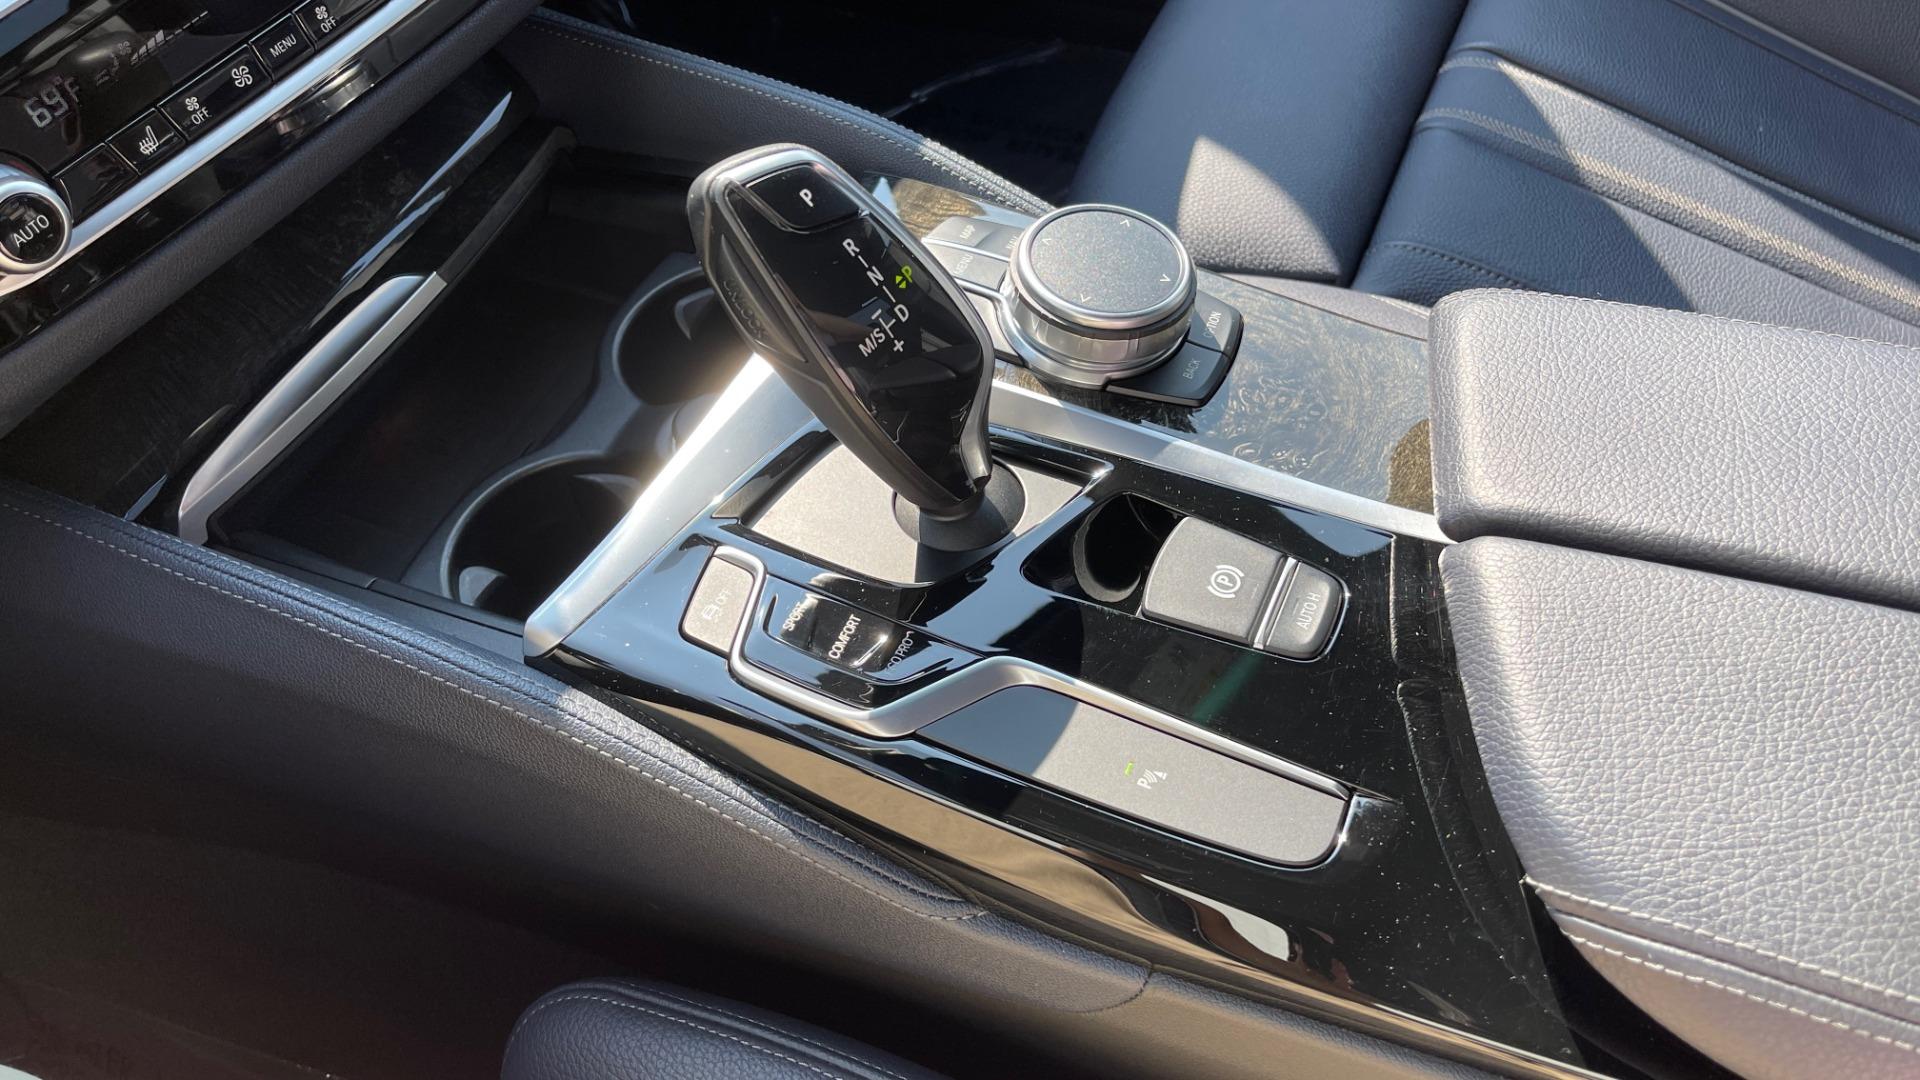 Used 2018 BMW 5 SERIES 540I XDRIVE M-SPORT / DRVR ASST / PDC / APPLE / HUD / H/K SND for sale $42,795 at Formula Imports in Charlotte NC 28227 48